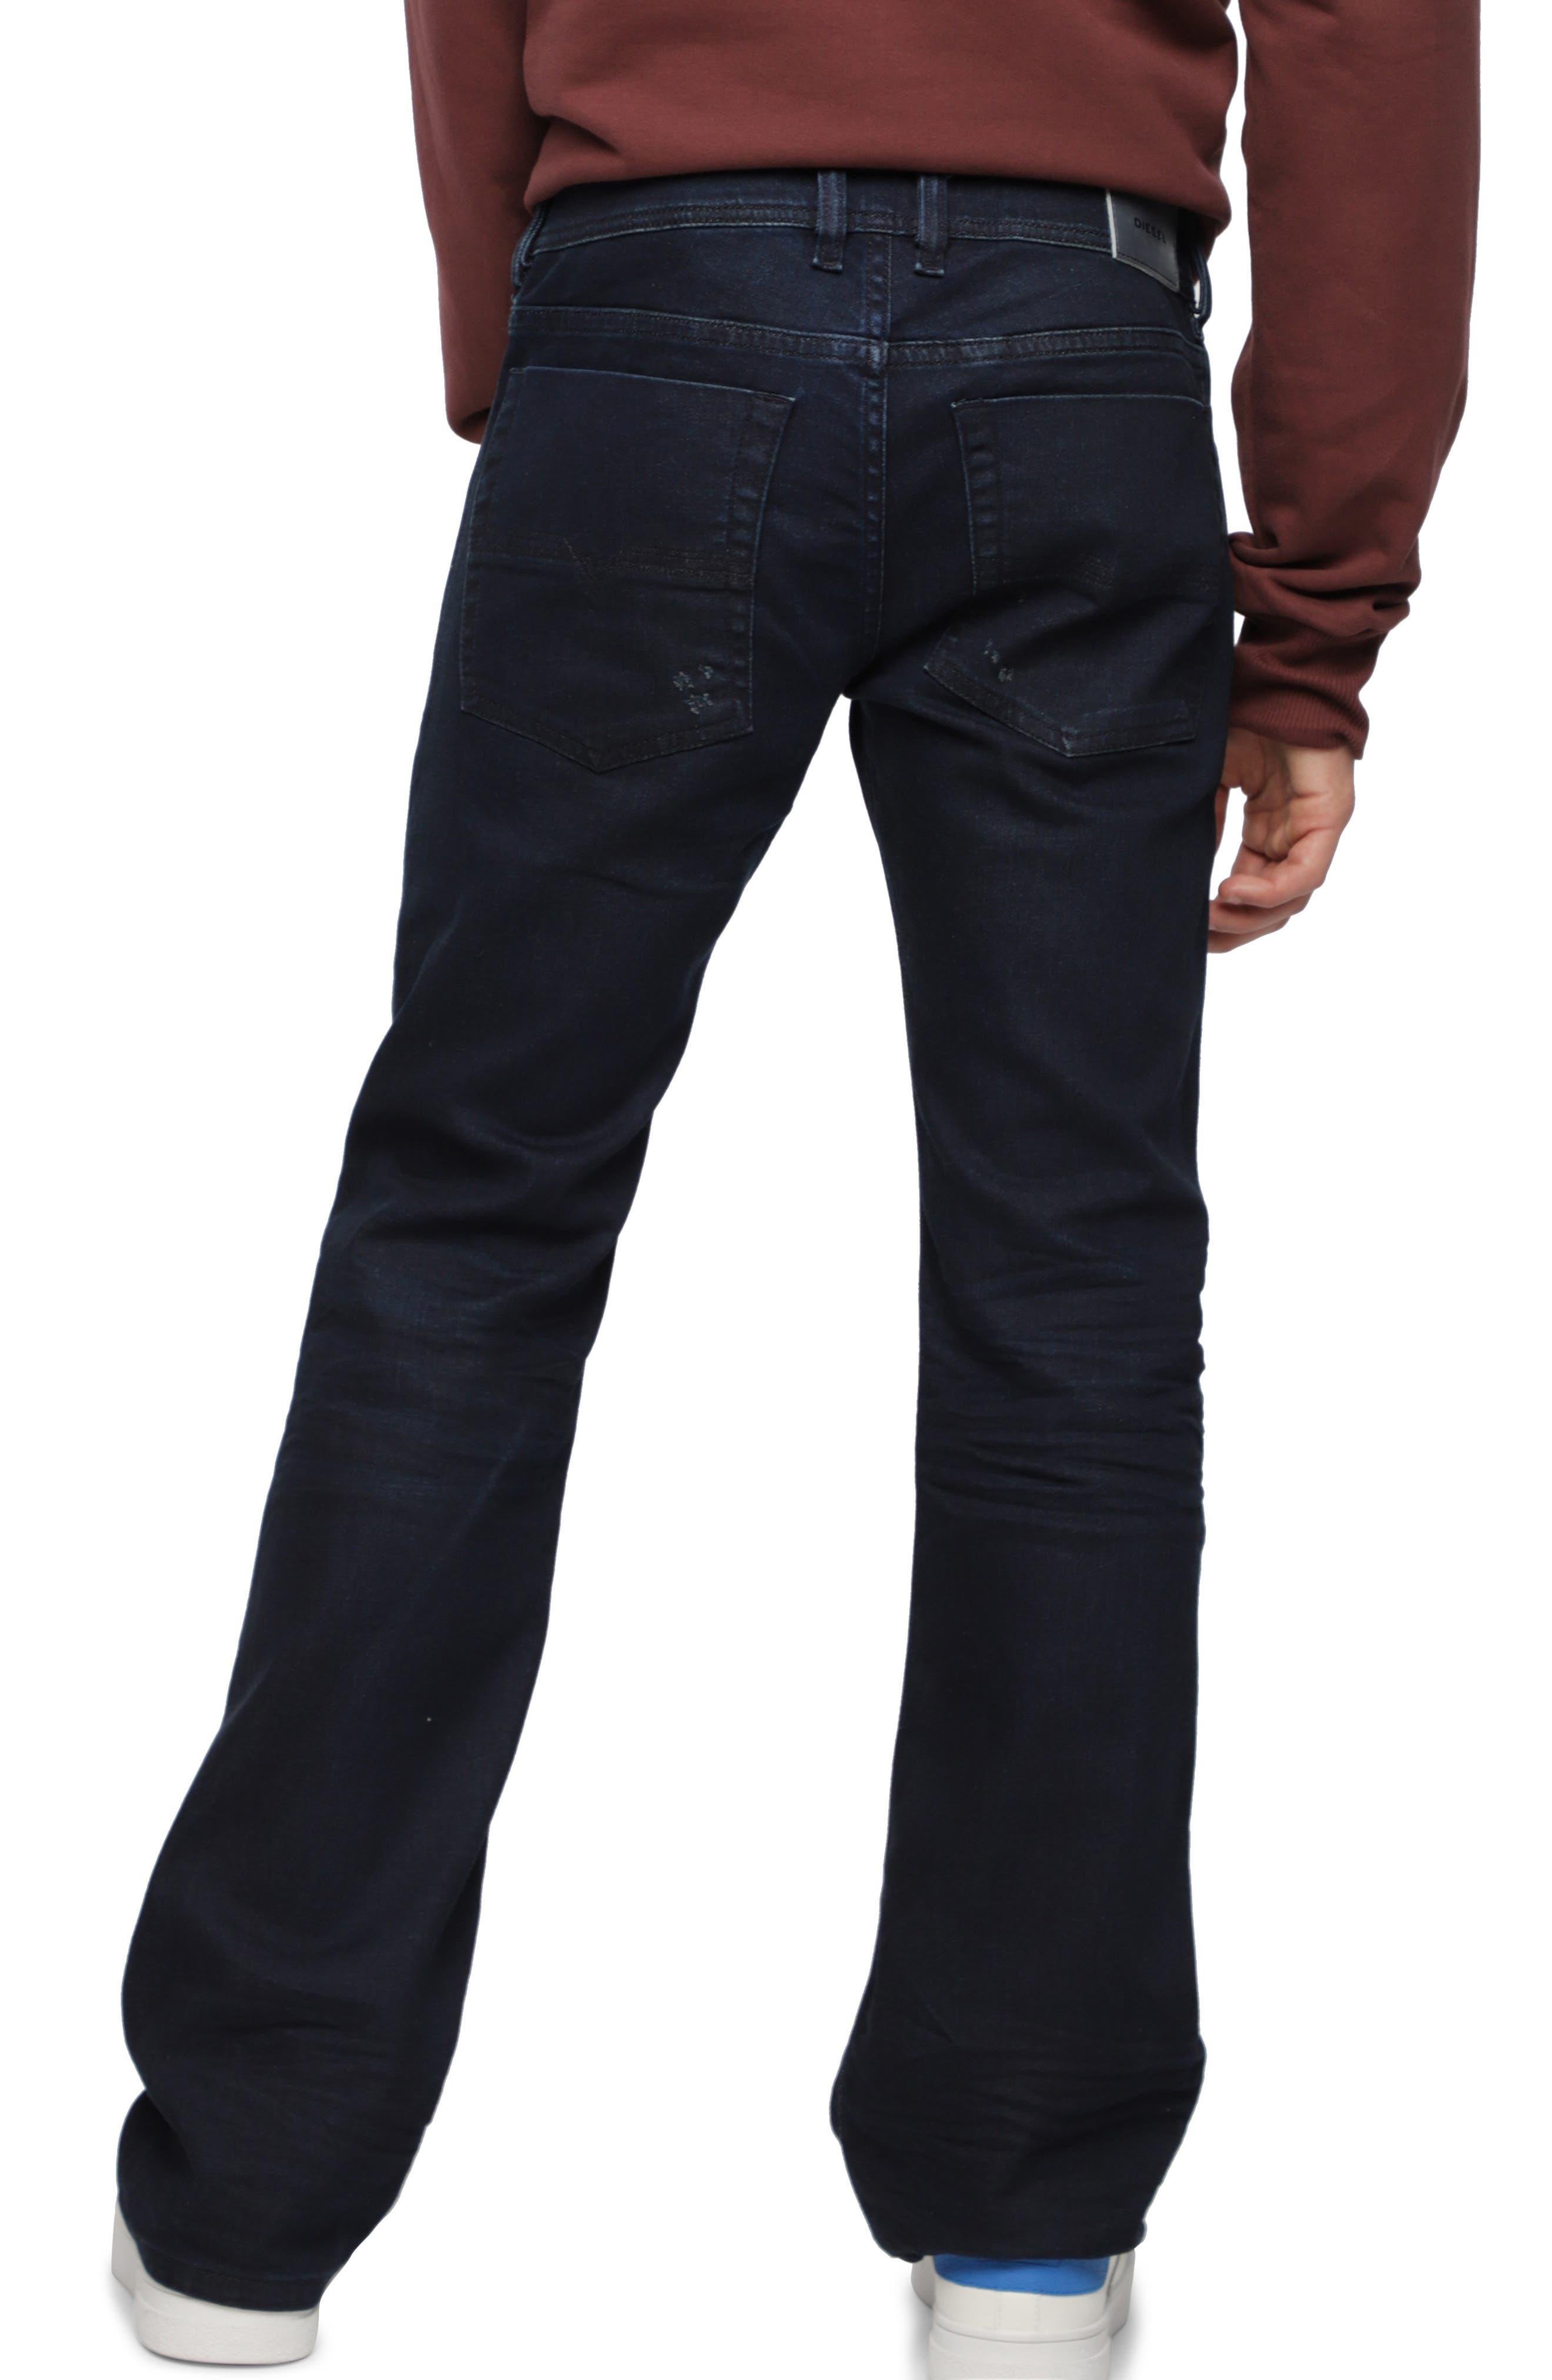 Zatiny Bootcut Jeans,                             Alternate thumbnail 2, color,                             C84ZC